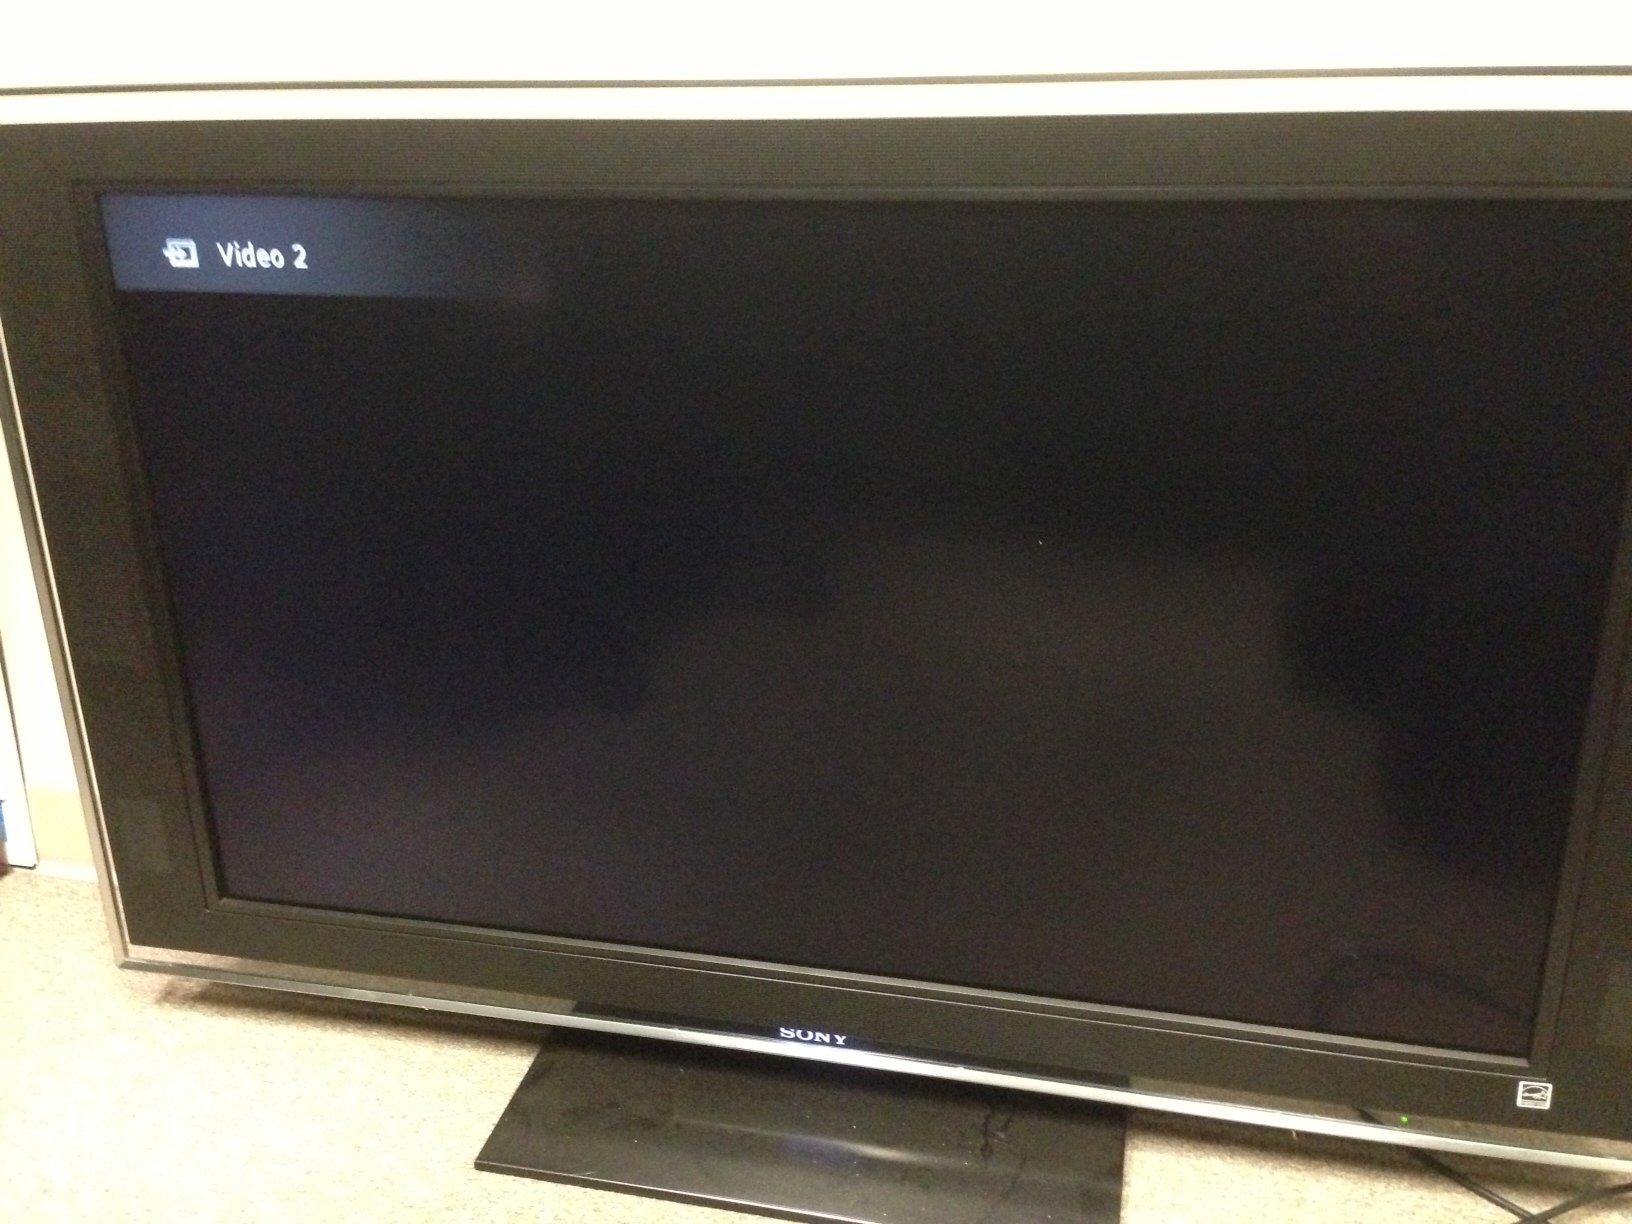 Sony KDL-46XBR4 Panel Problem - Page 3 - AVS Forum | Home